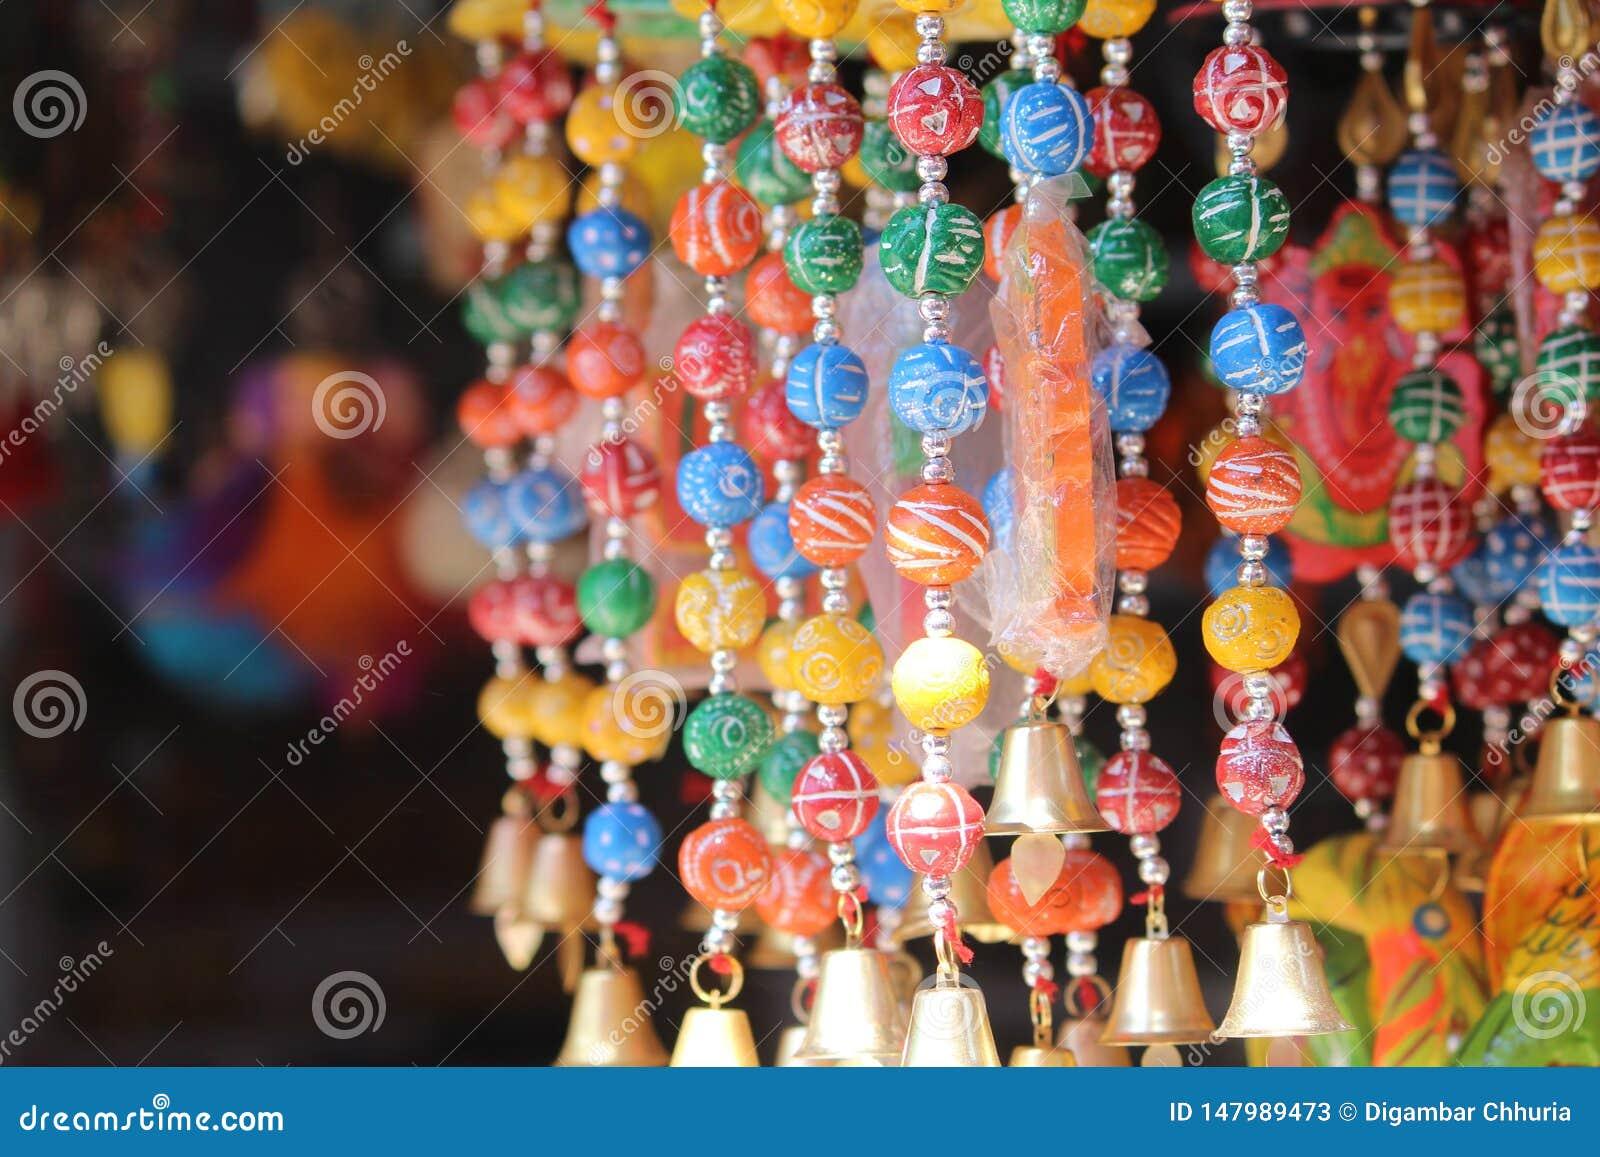 Colorful jeweler on market side